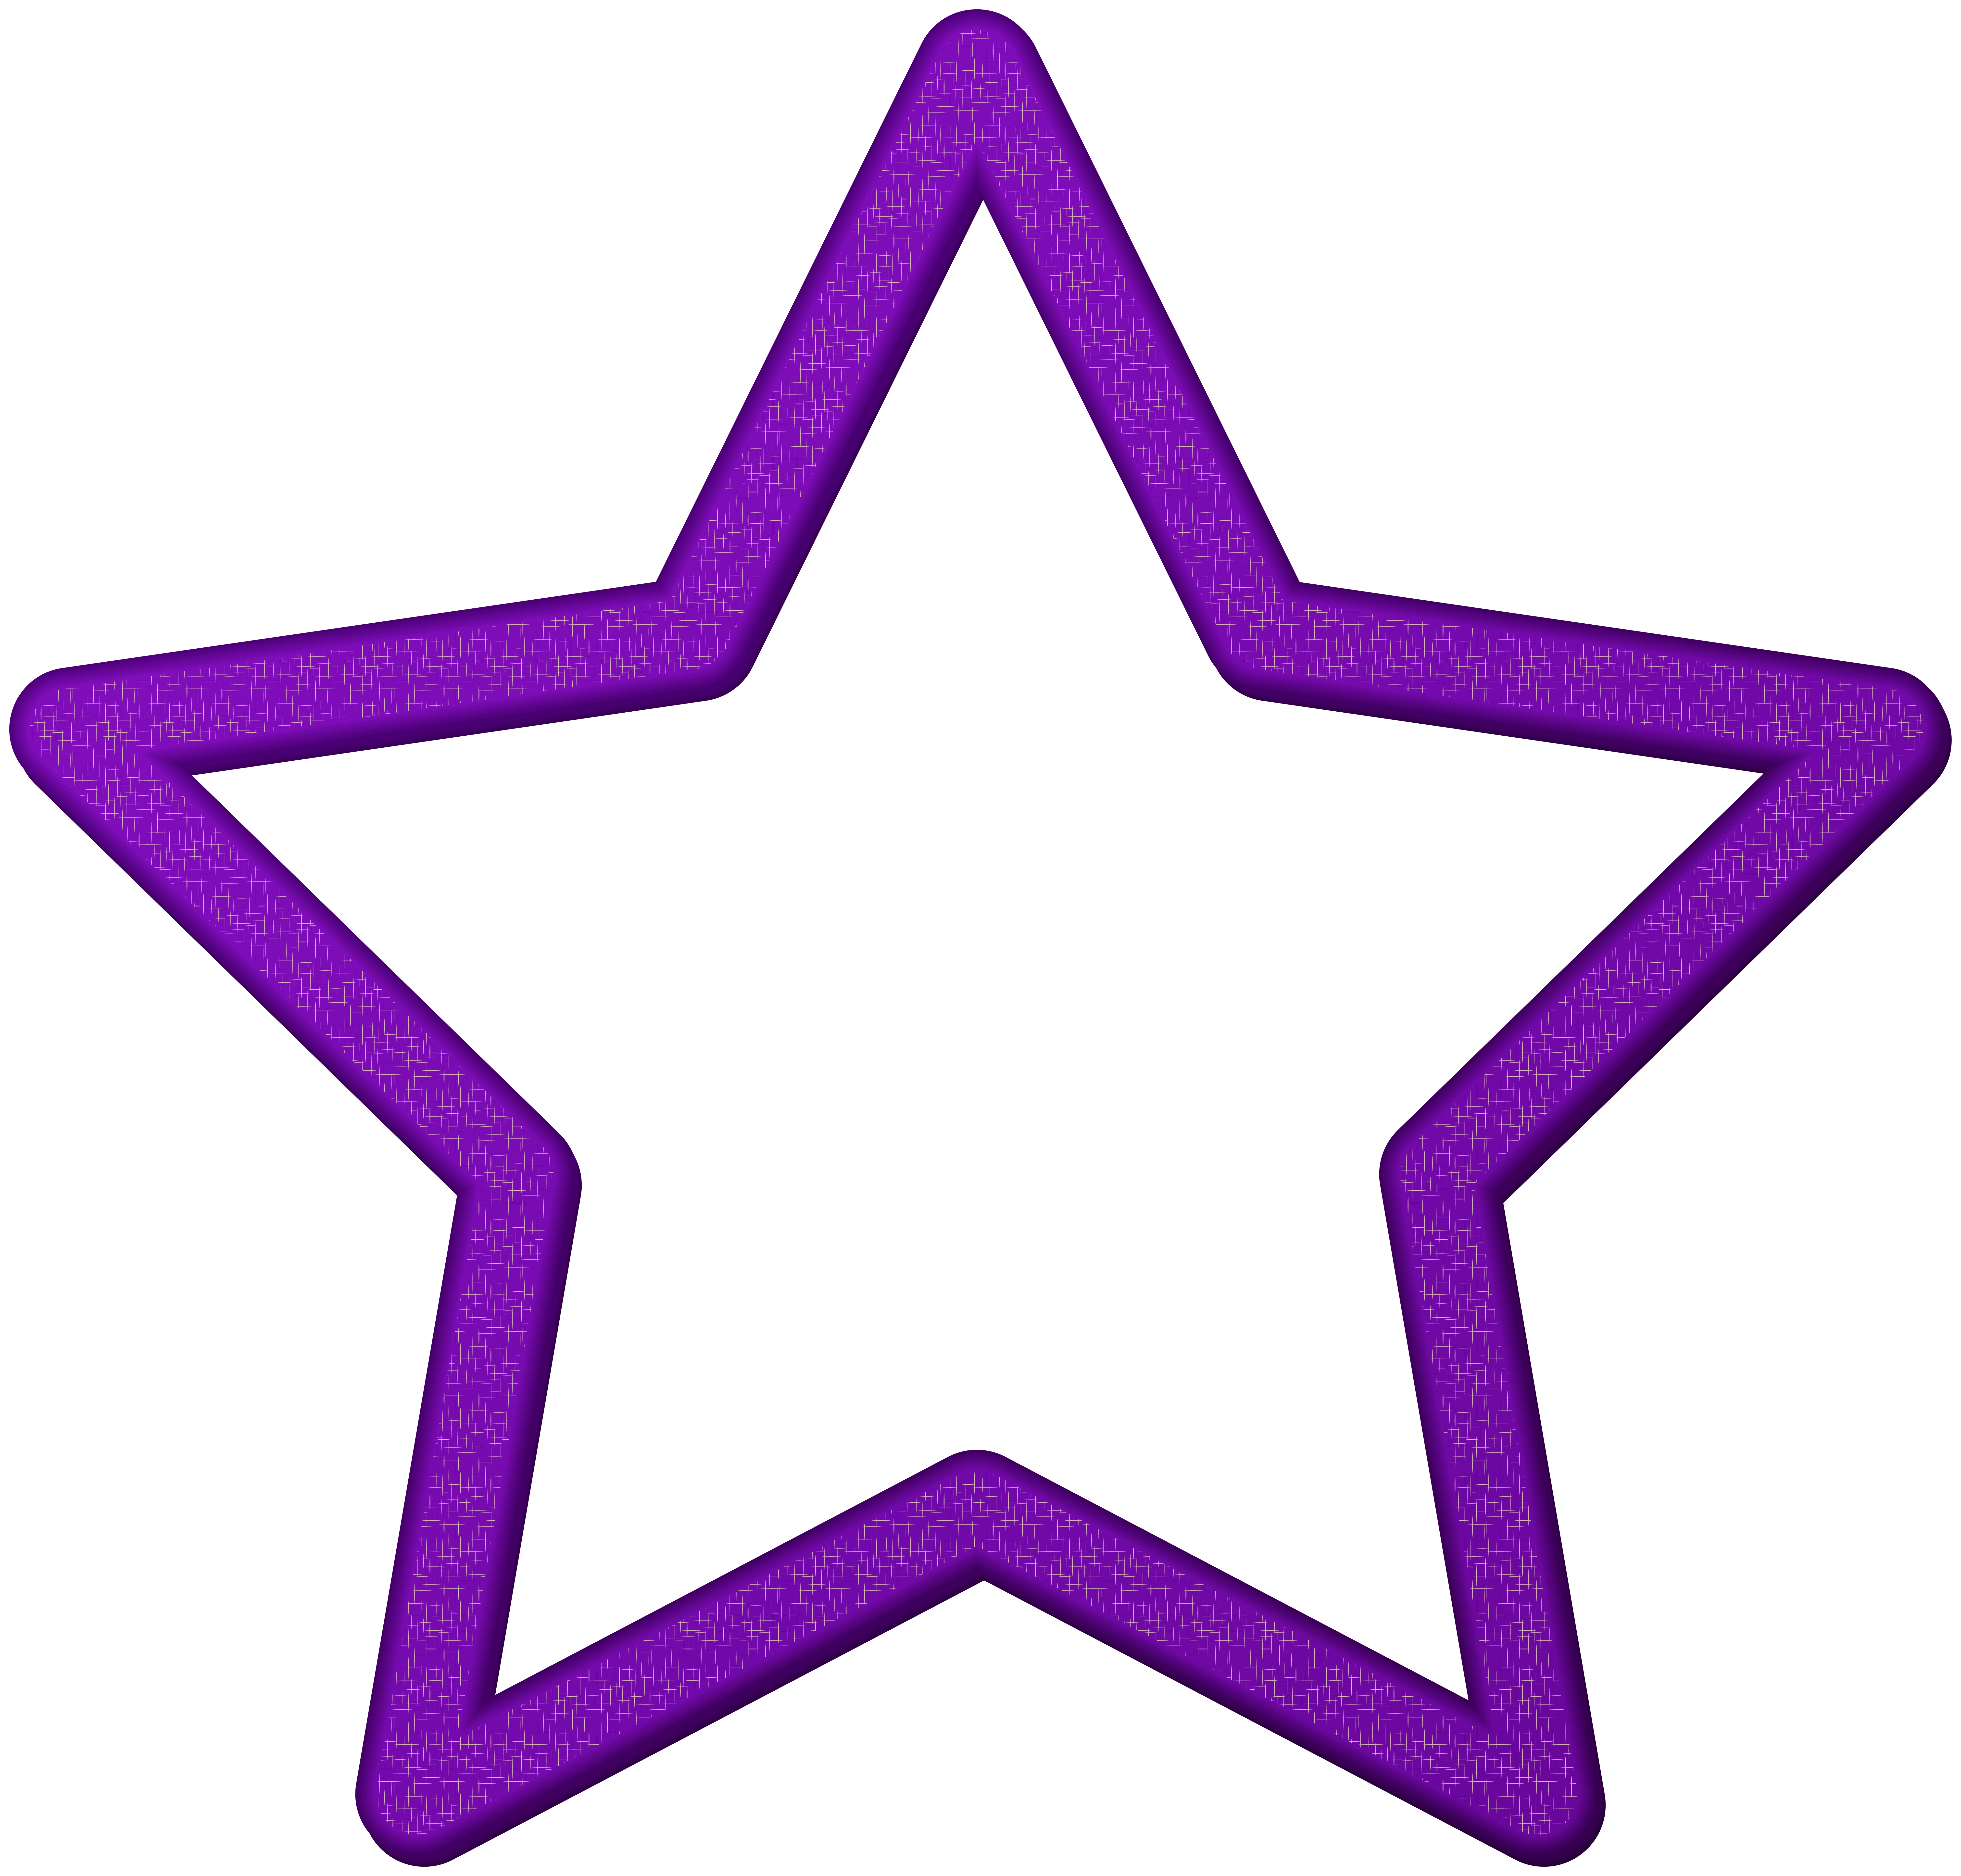 Purple Star Border Frame PNG Clip Art.